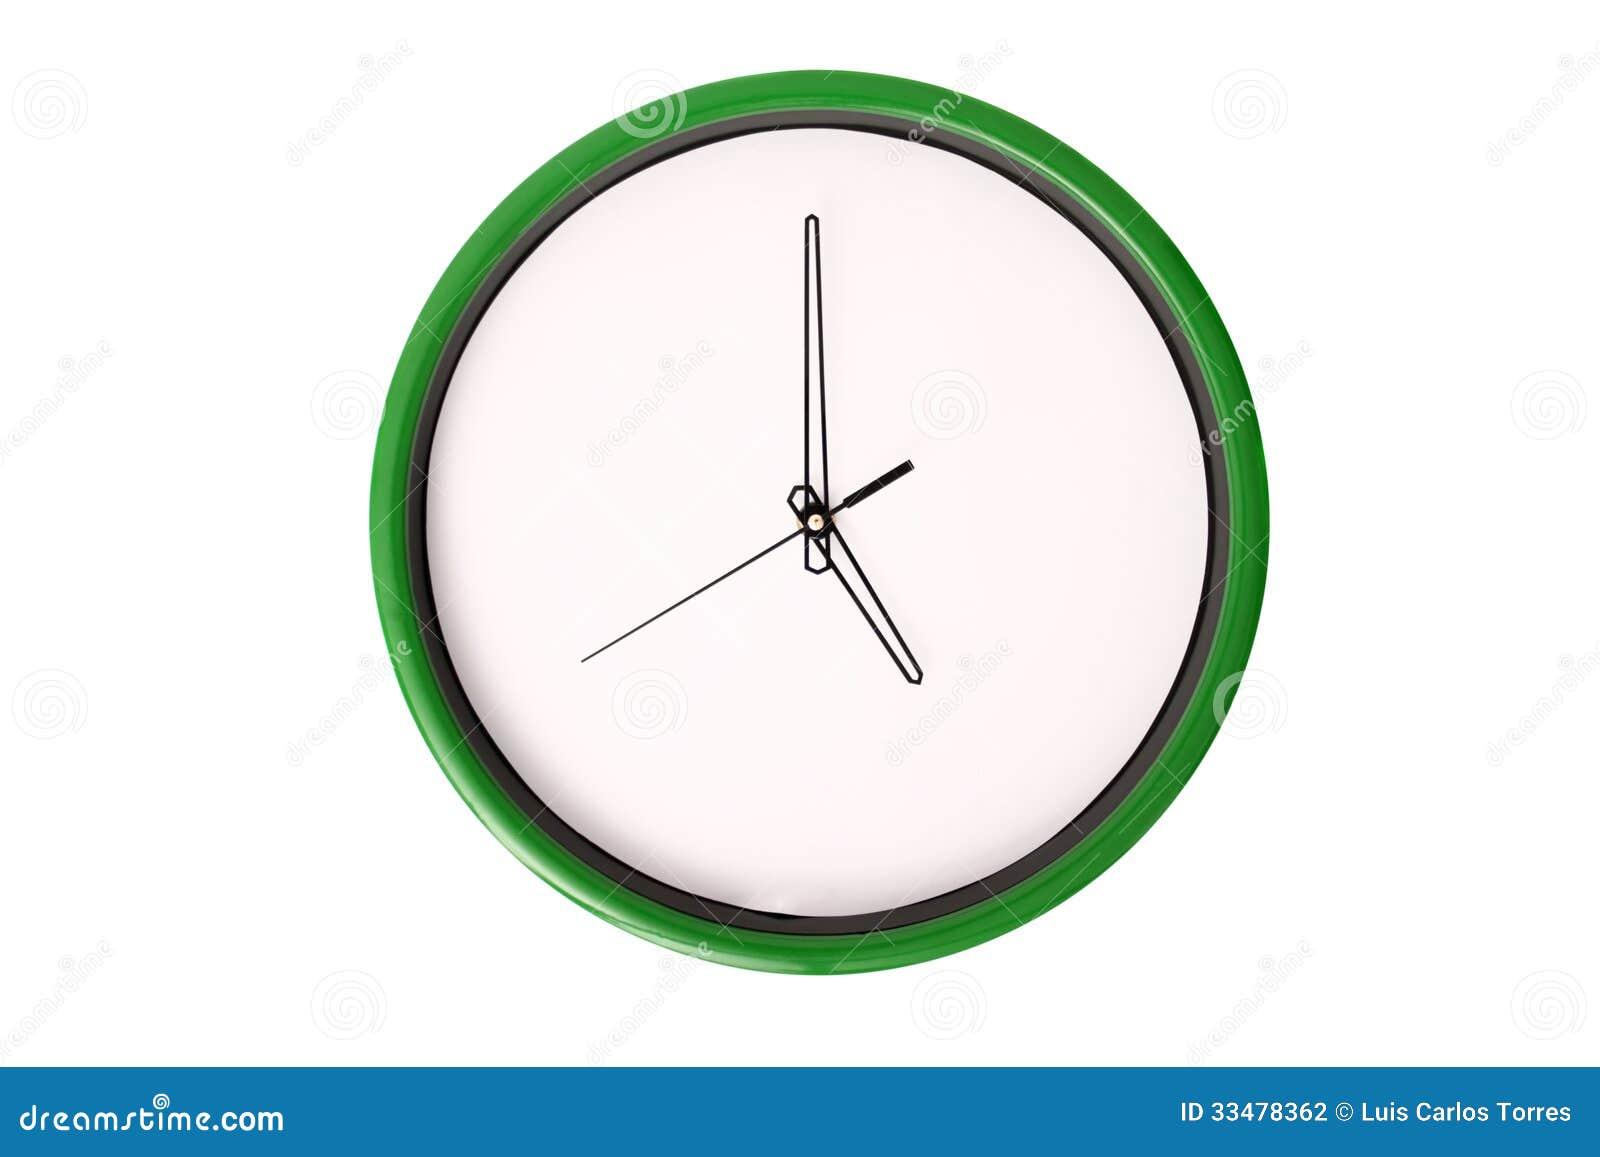 worksheet Empty Clock empty clock serie 5 oclock stock photo image 33478362 royalty free photo